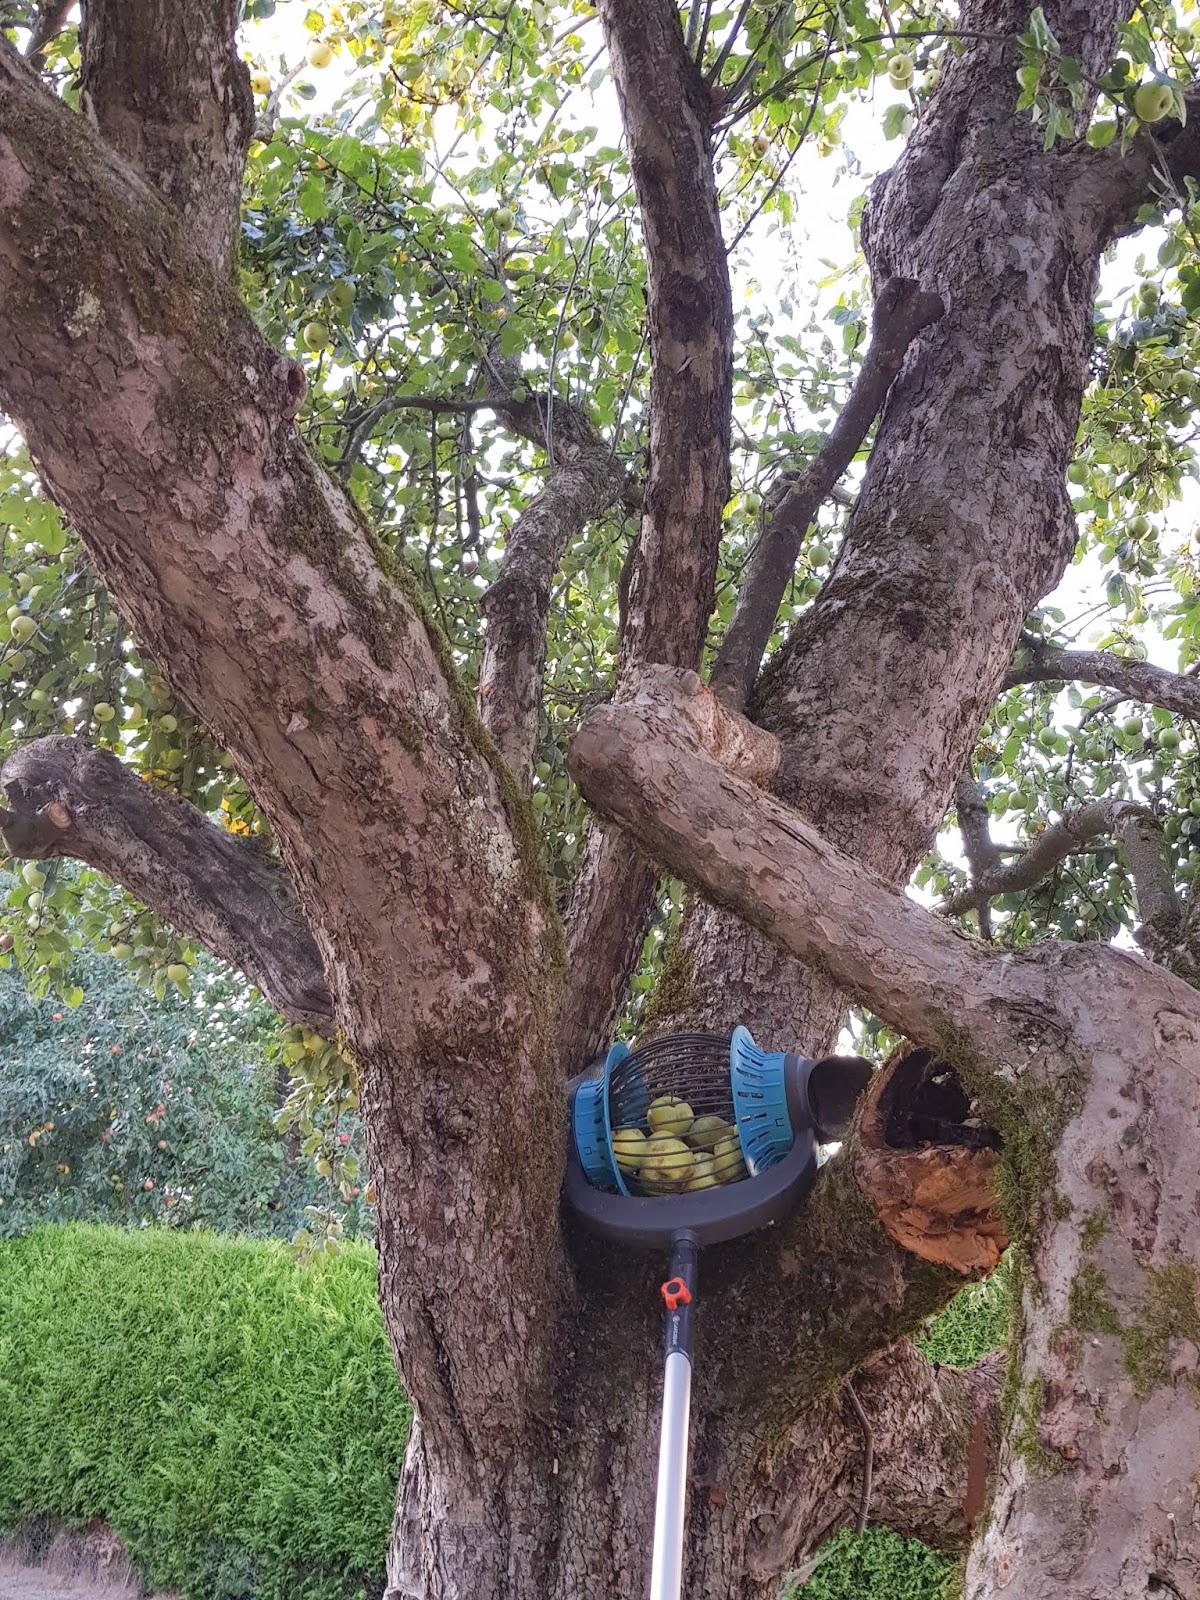 Tipp zum Äpfel sammeln. leicht gemacht mit dem Rollsammler Herbst, Rücken, Rückenschonend, Tipps, Ratgeber, pflücken2